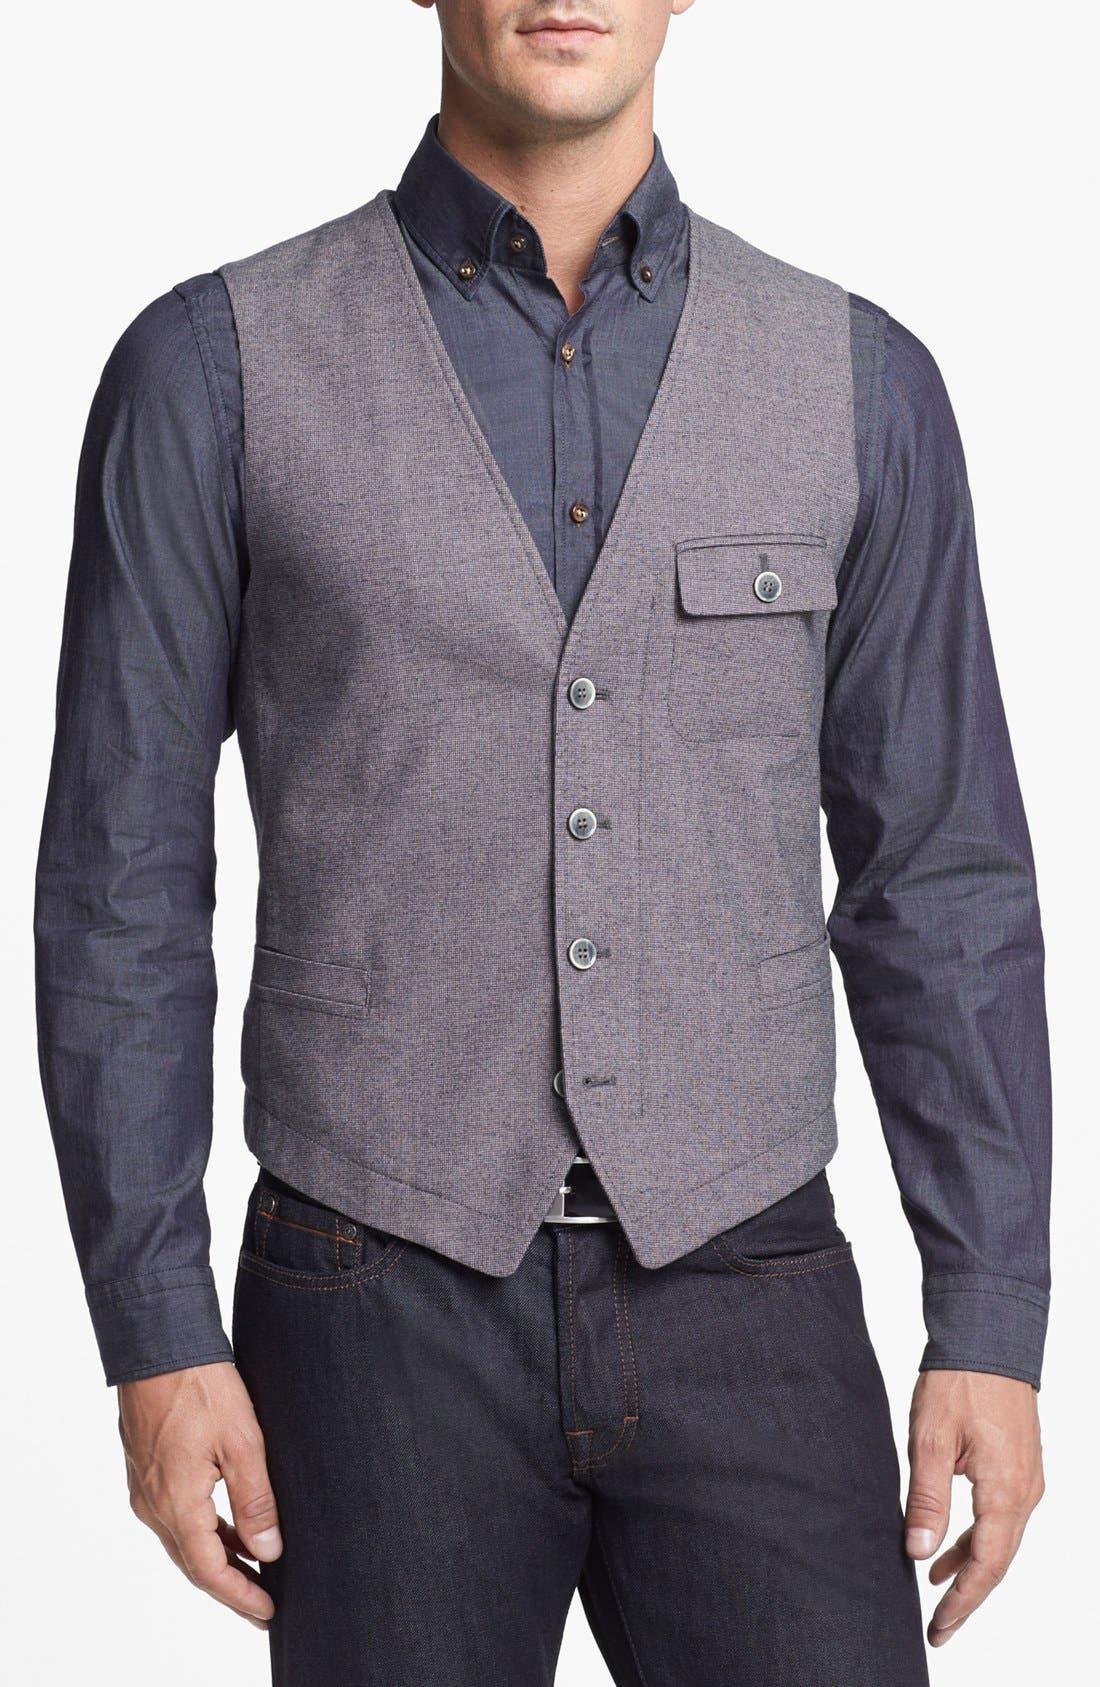 Main Image - BOSS HUGO BOSS 'Cinor' Vest